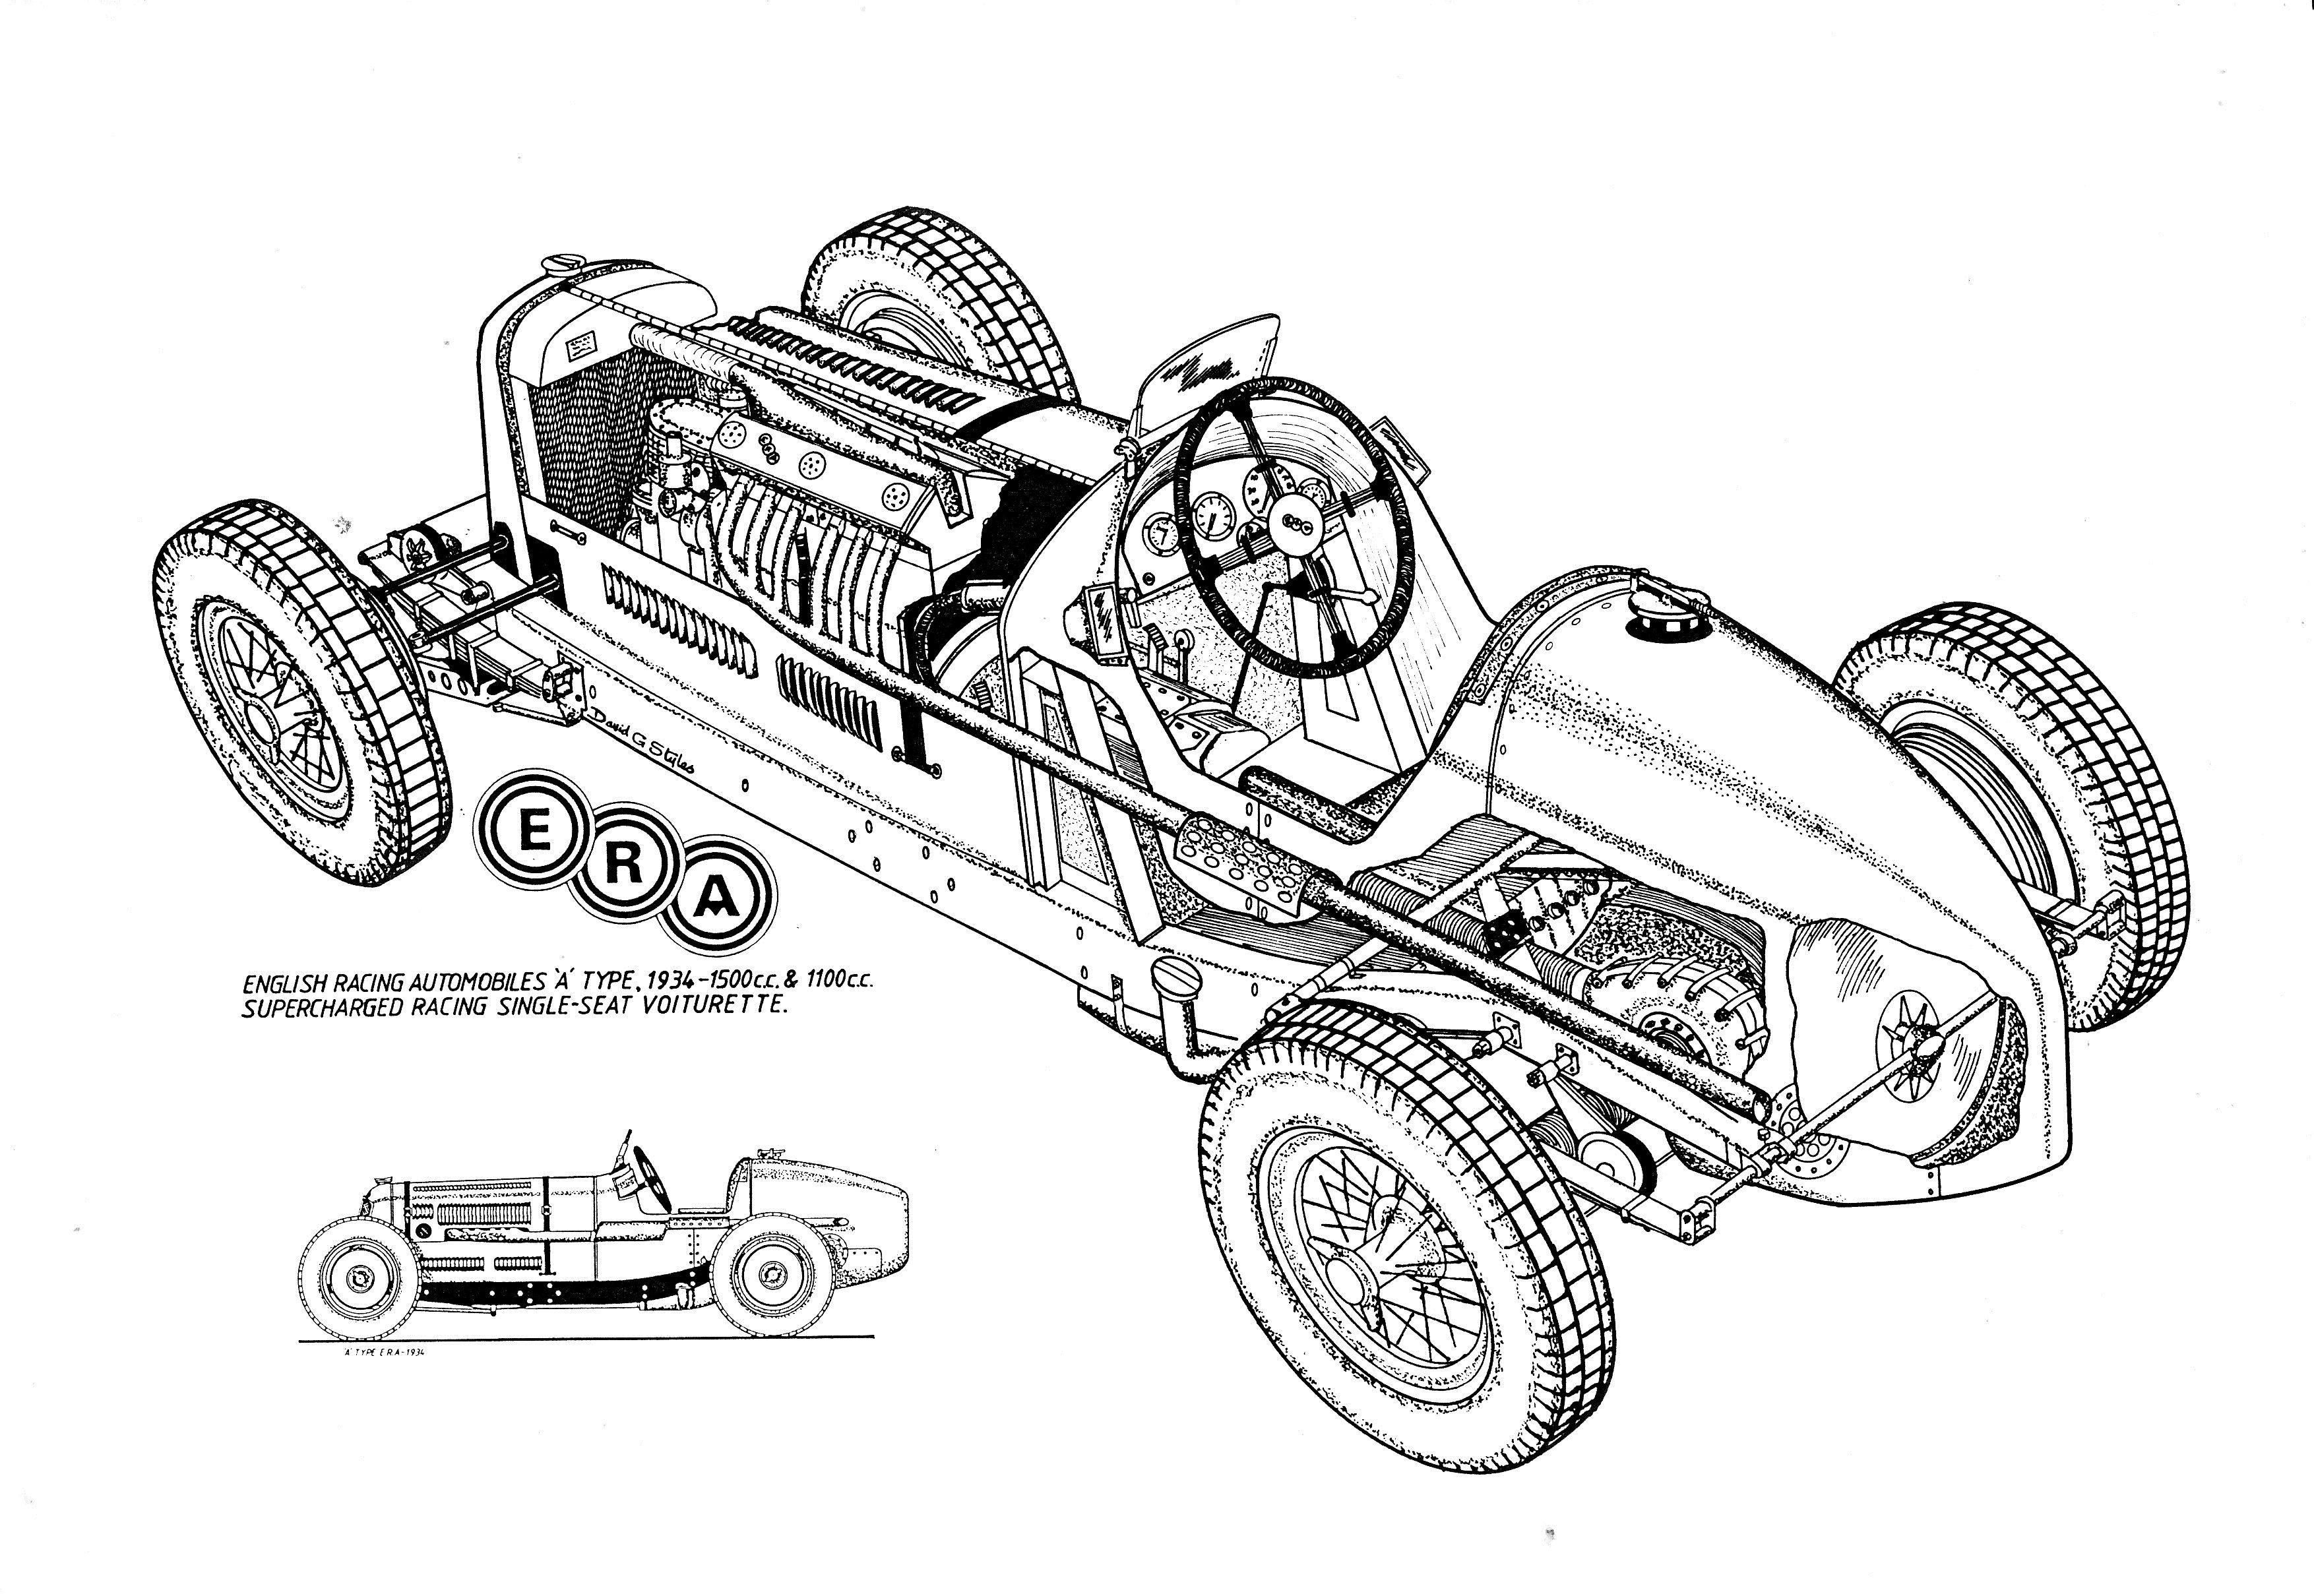 Era English Racing Automobiles Type R1a Cc